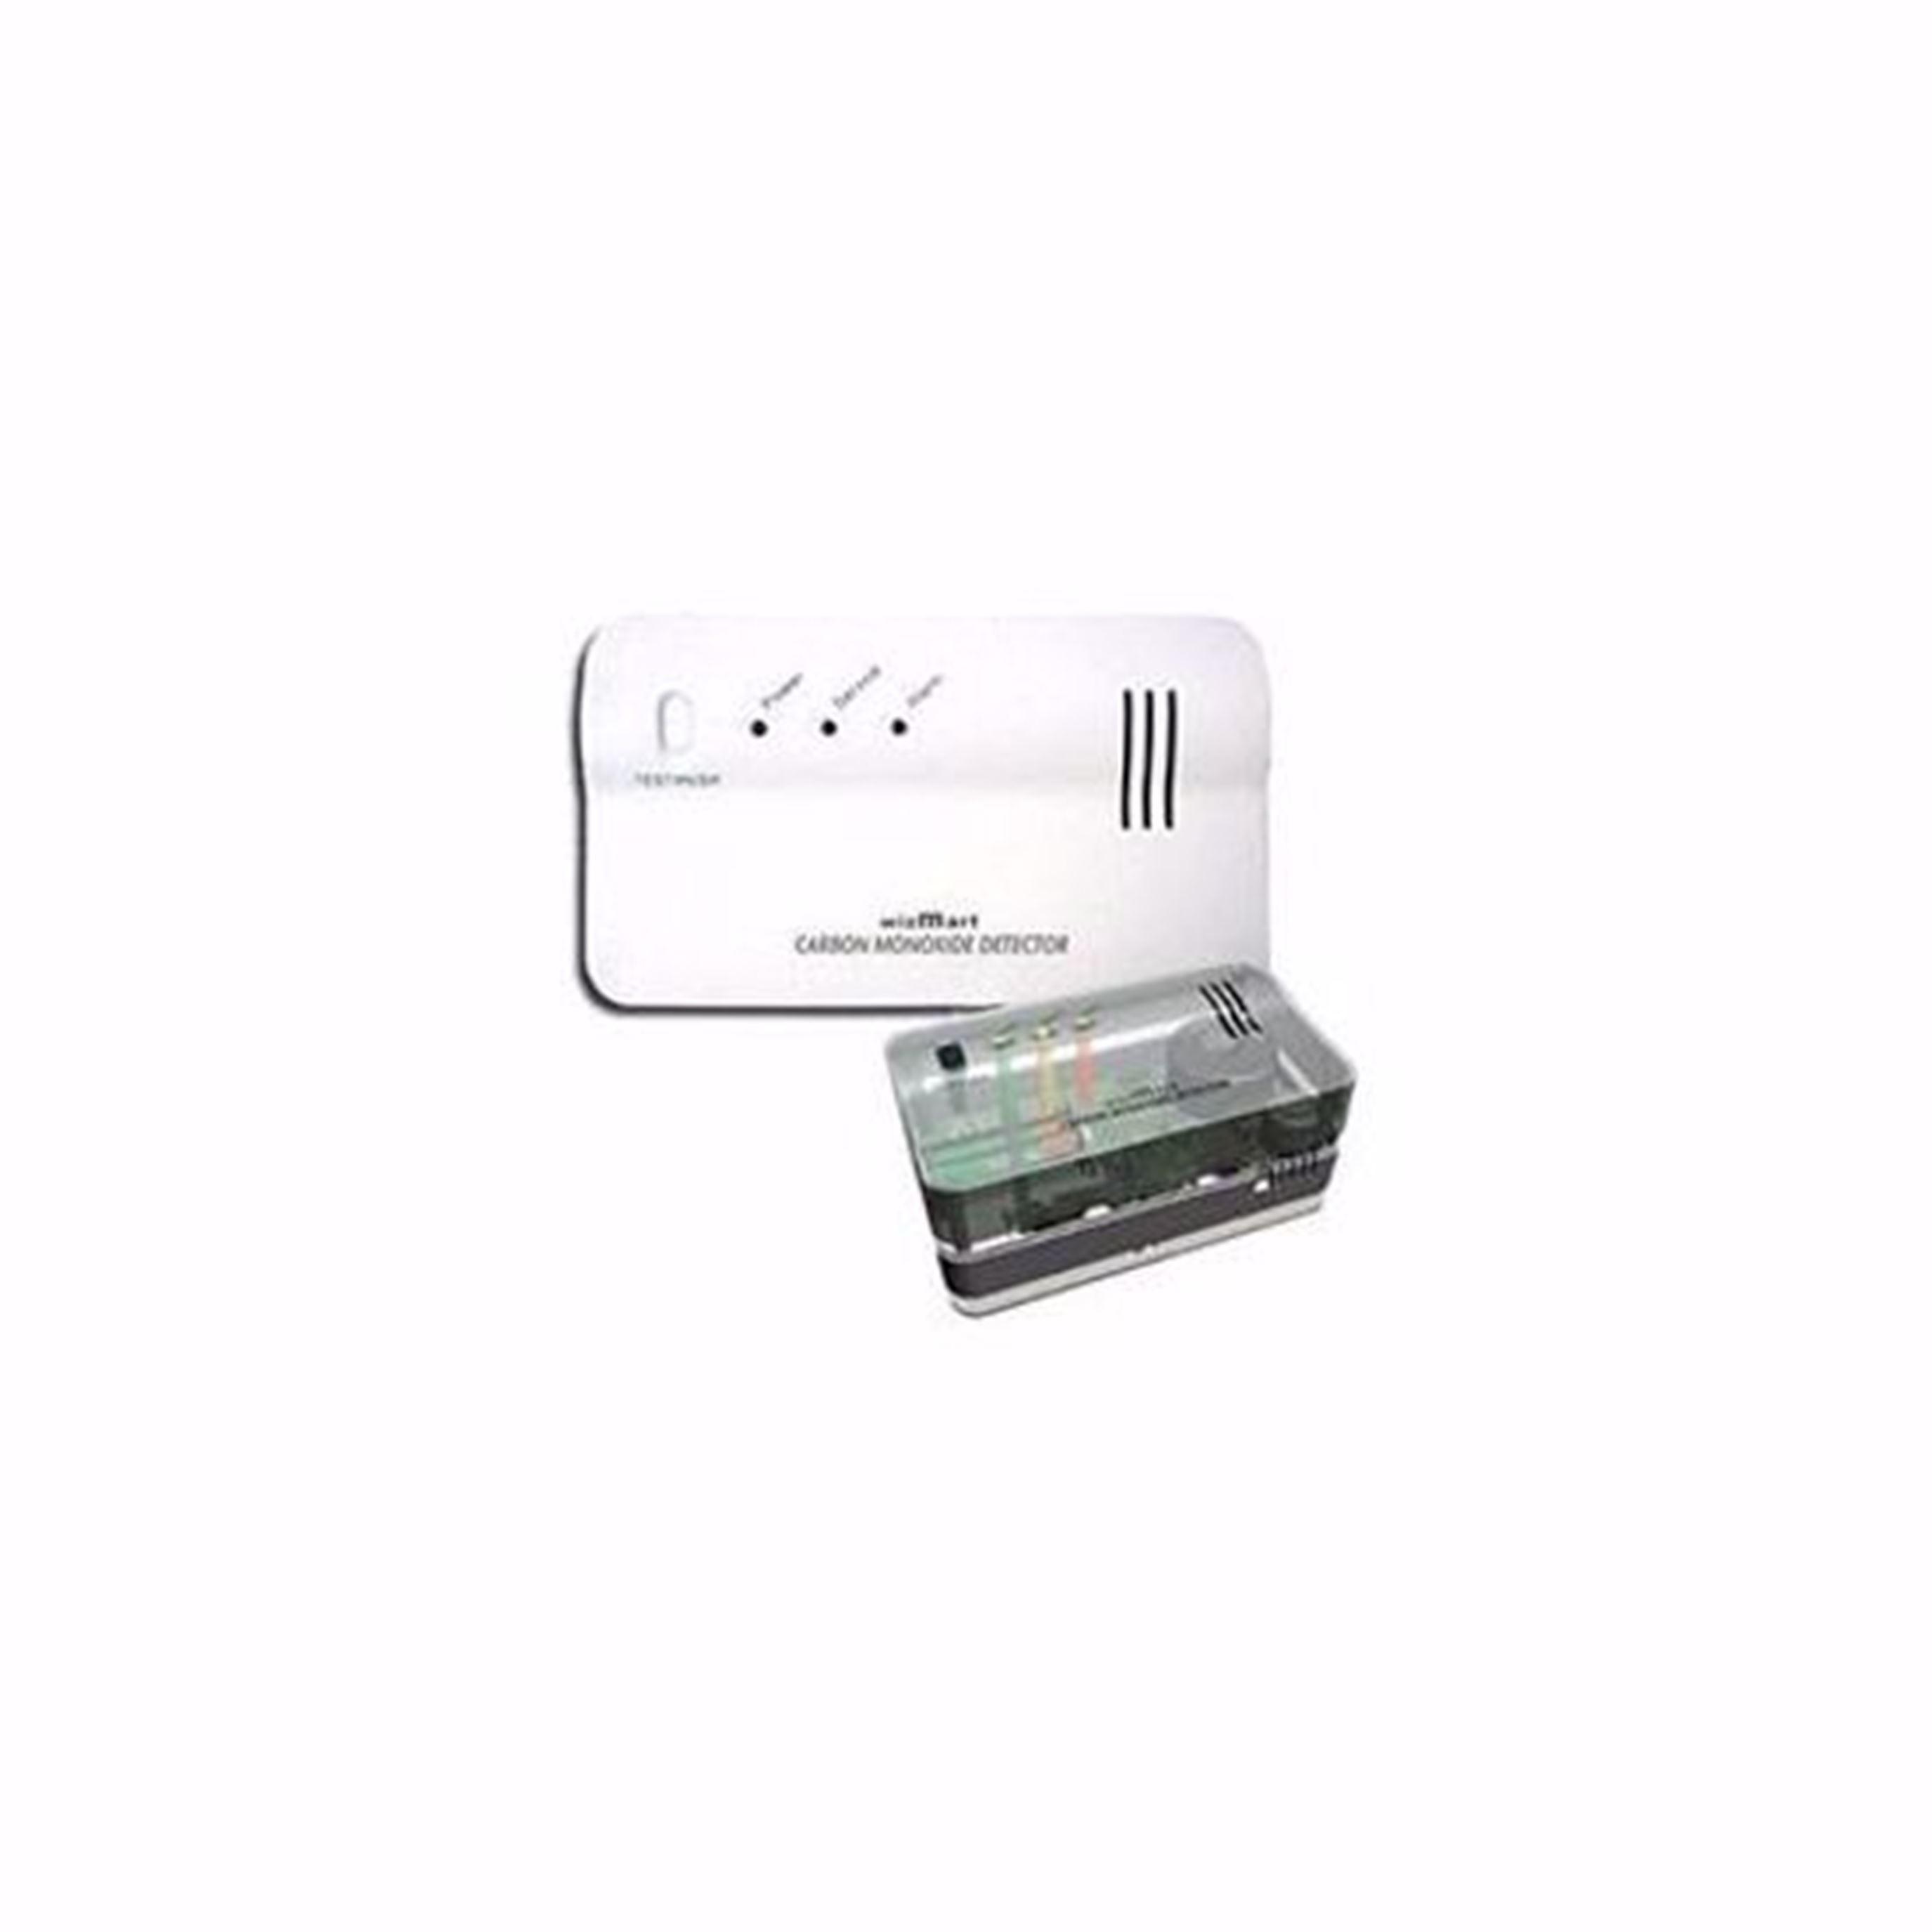 WizMart NB-983-NG Zemni gas detektor